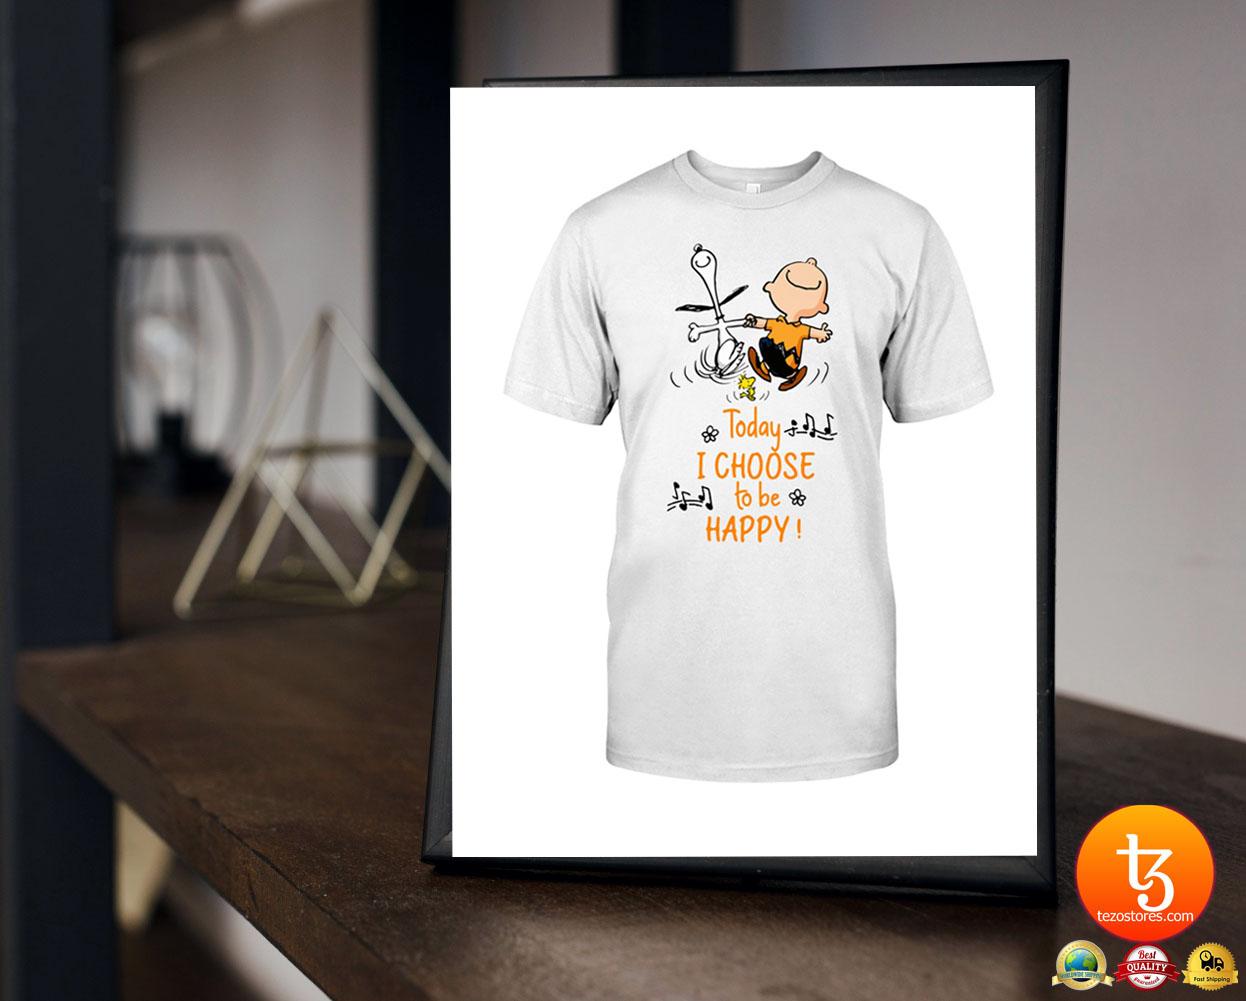 Peanuts Snoopy today i choose to be happy shirt